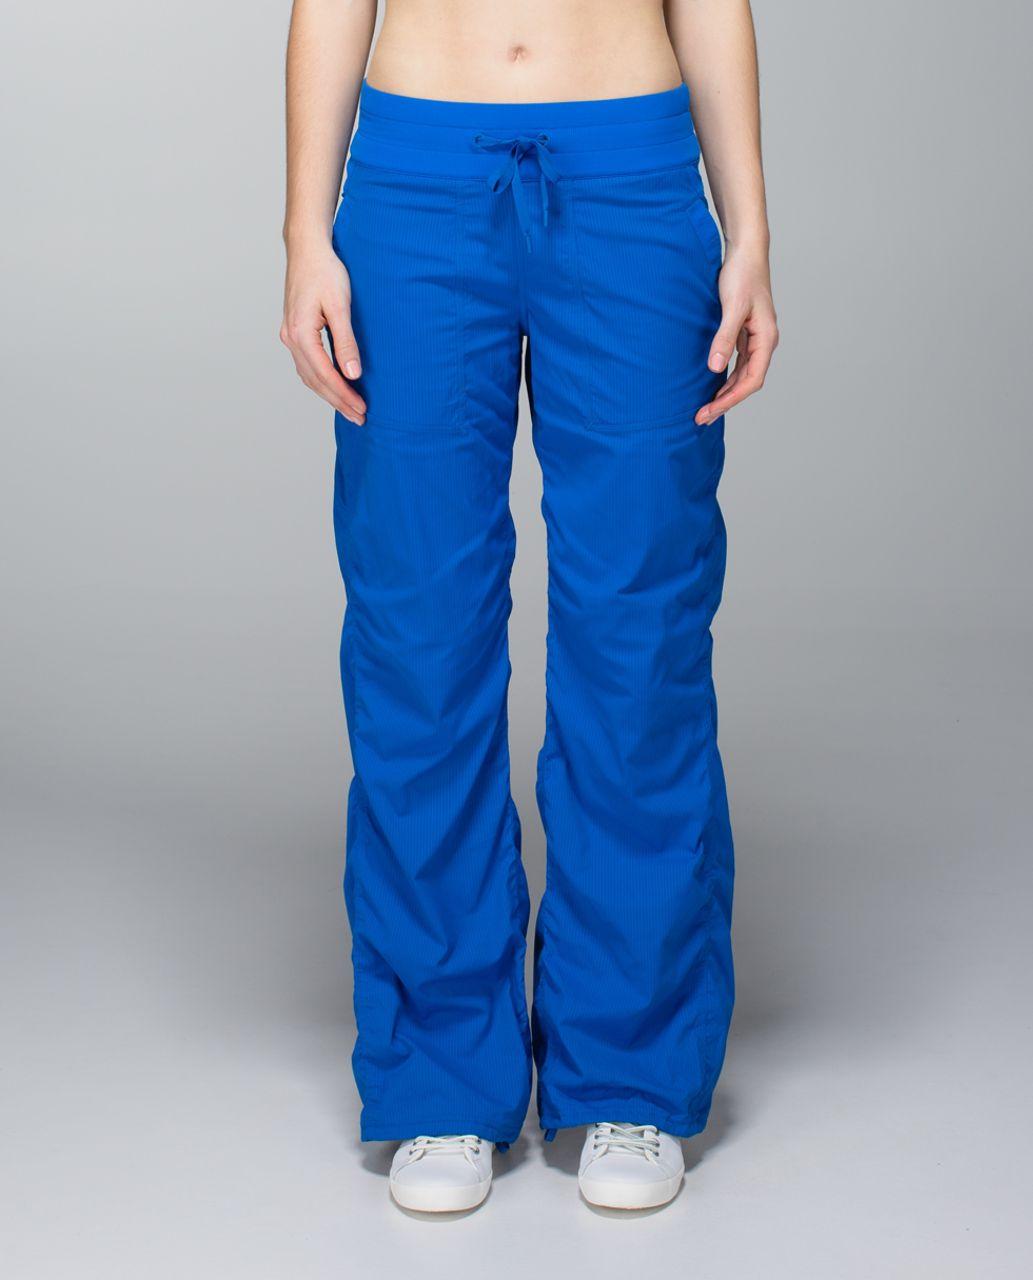 Lululemon Studio Pant II *No Liner (Regular) - Baroque Blue